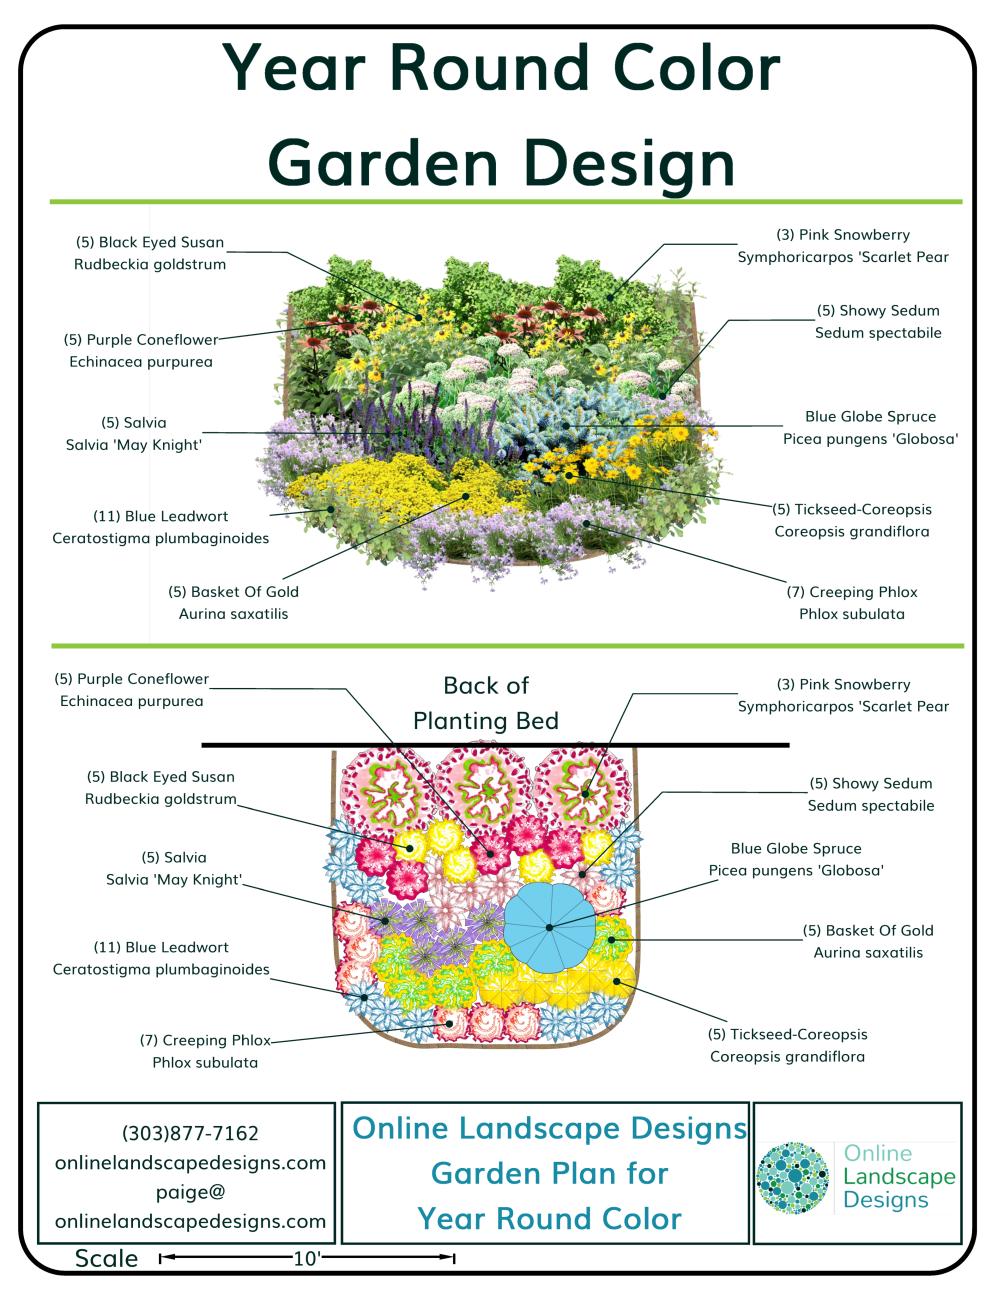 Garden Design Plan for Year Round Color in 2020 | Year ...